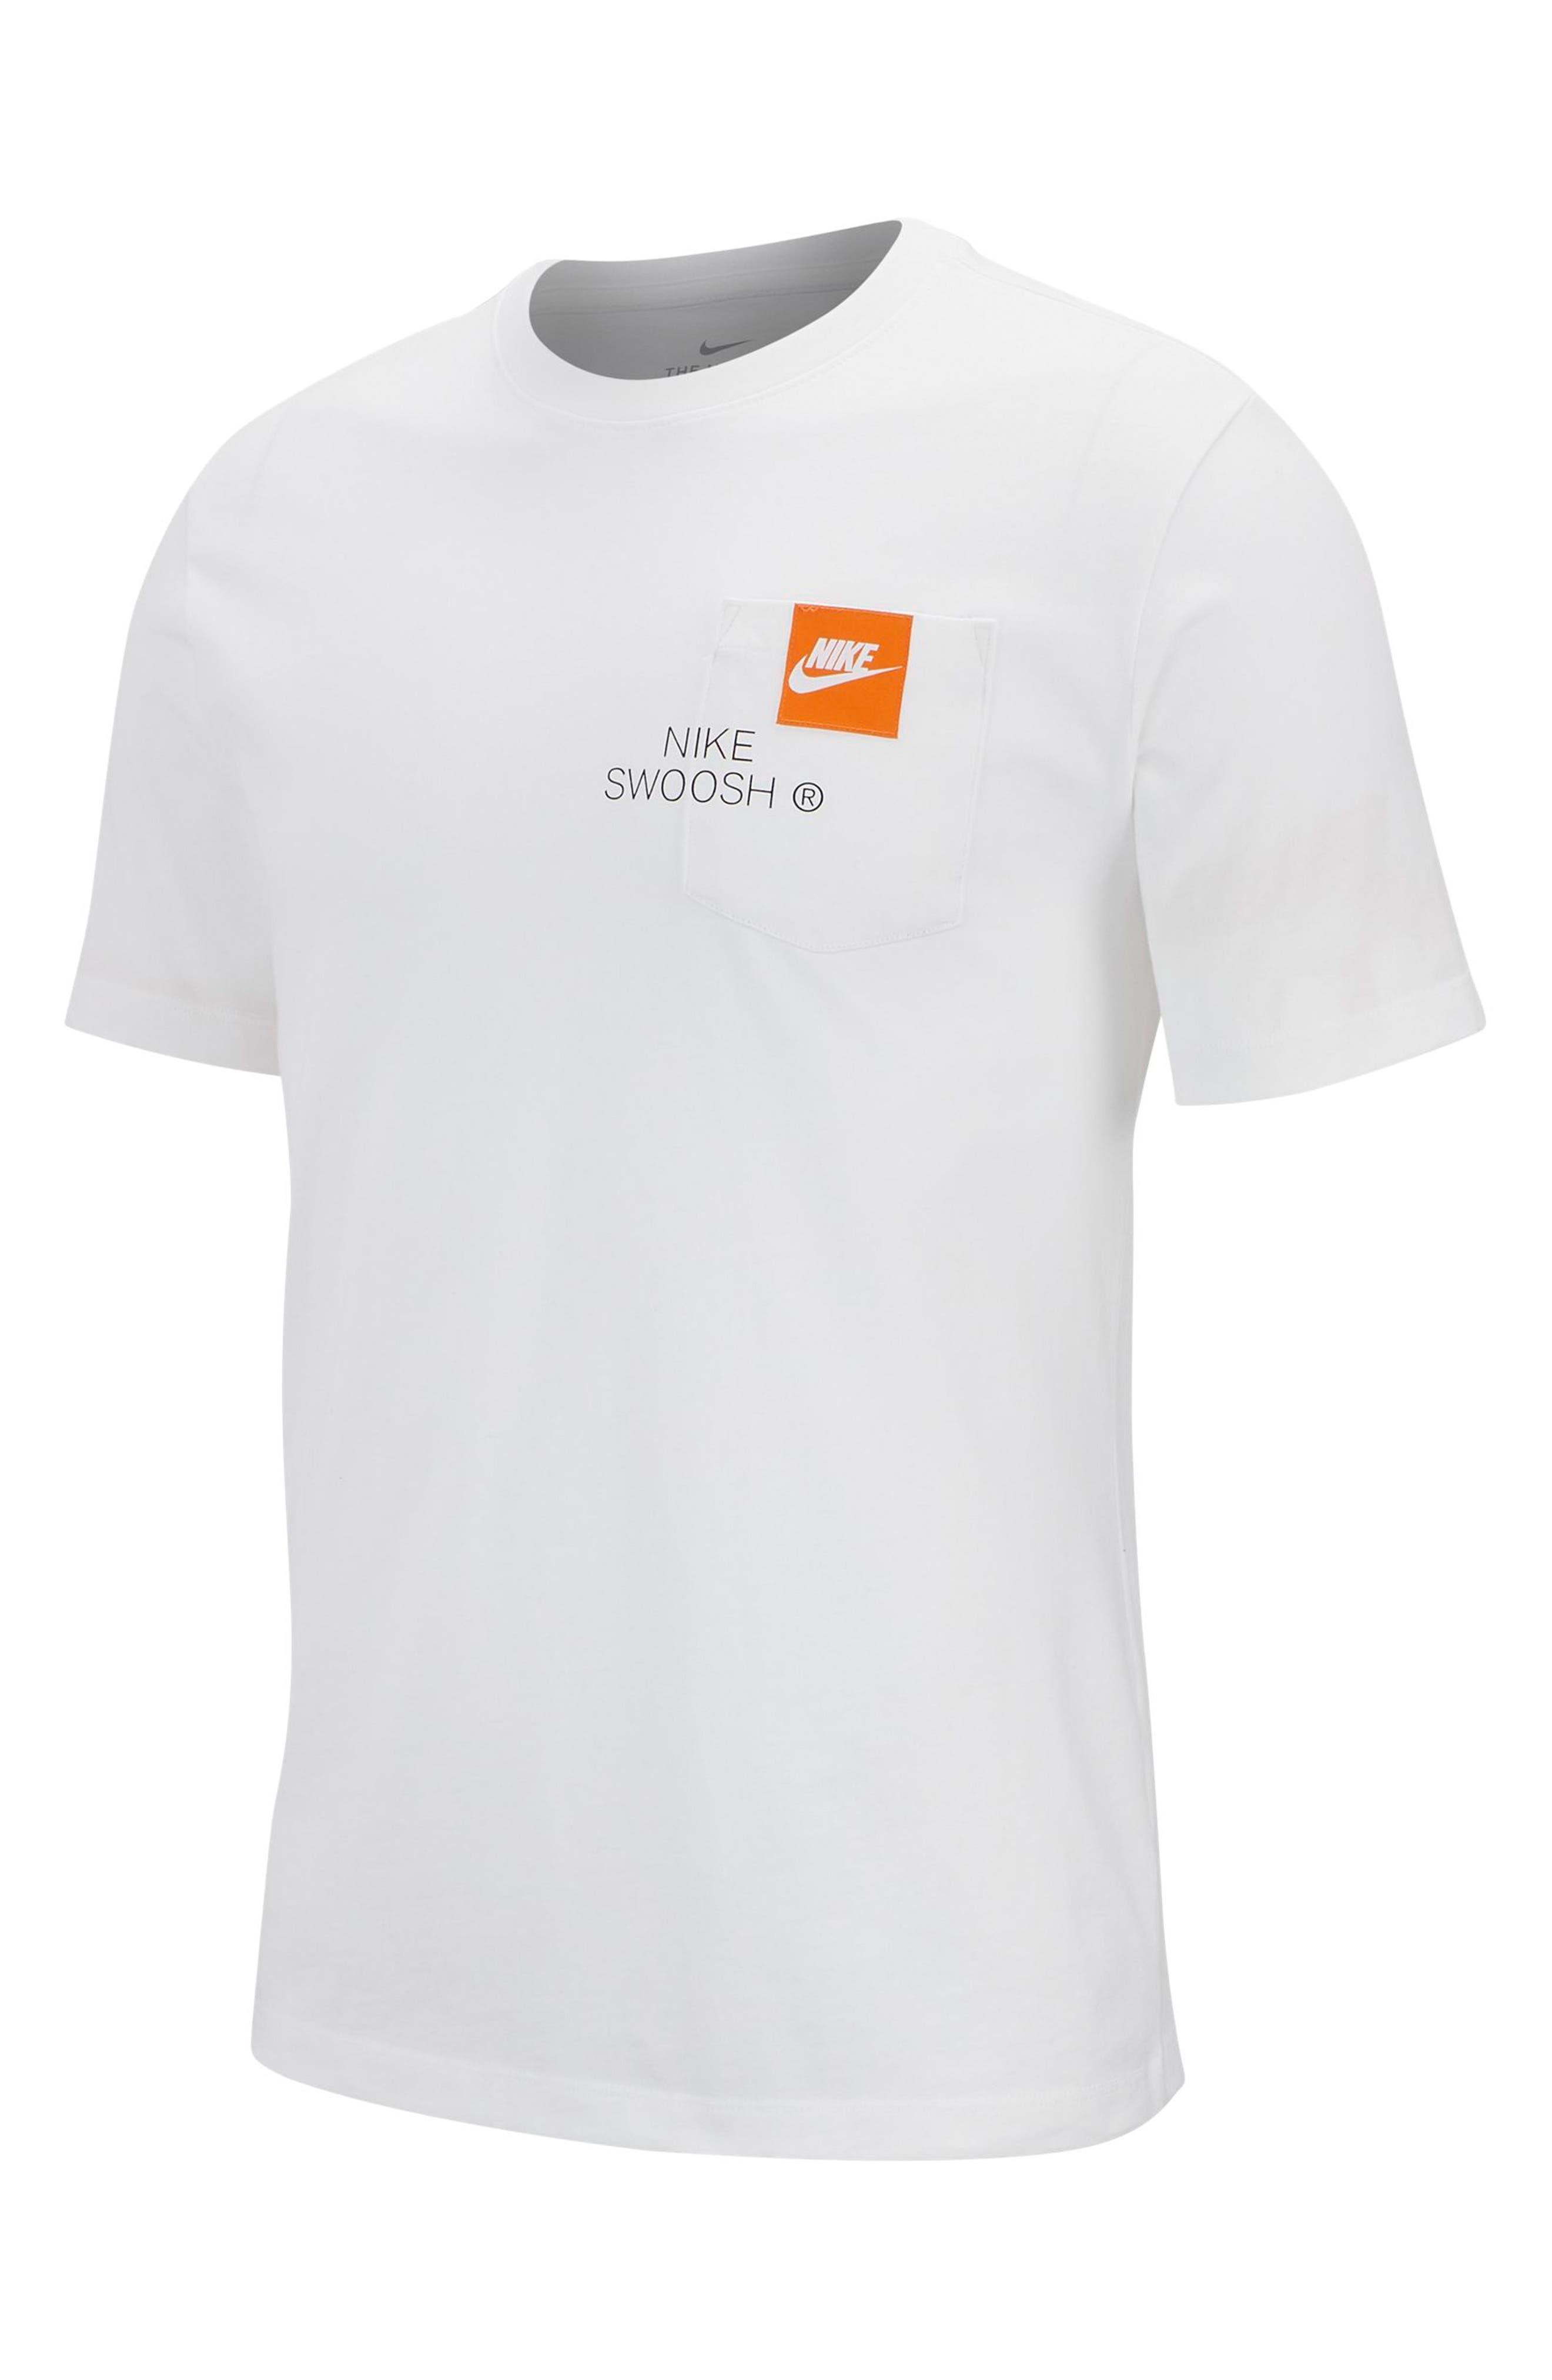 Sportswear Men's T-Shirt, Main, color, WHITE